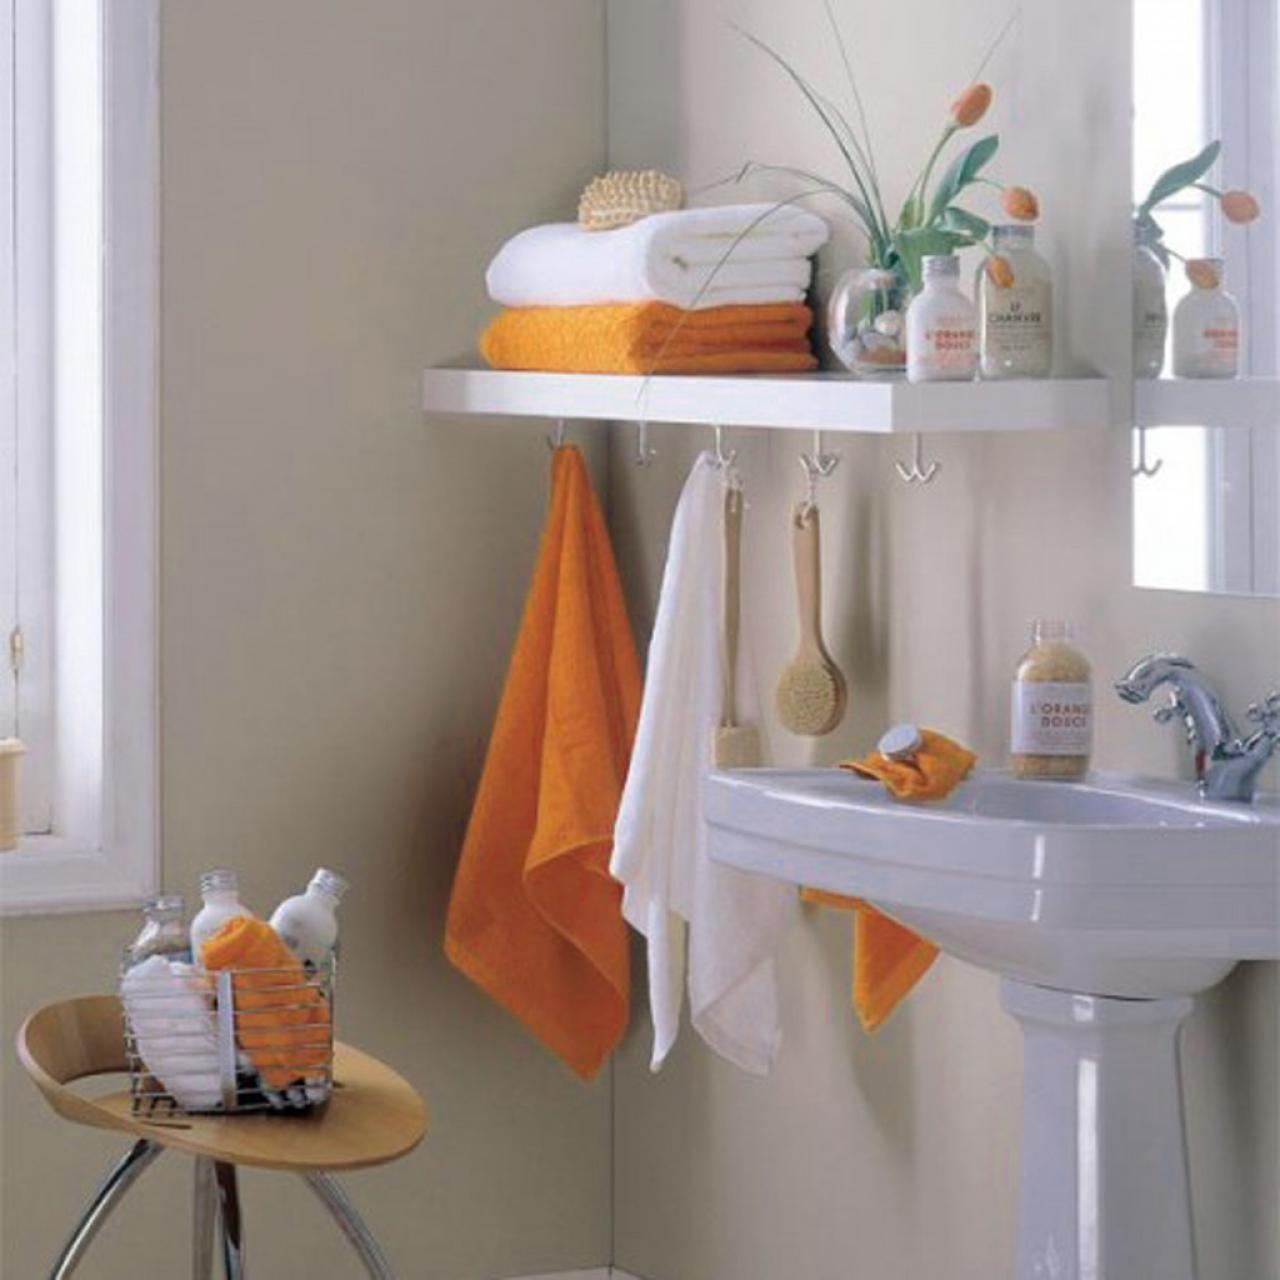 small-storage-bathroom-with-hanging-racks